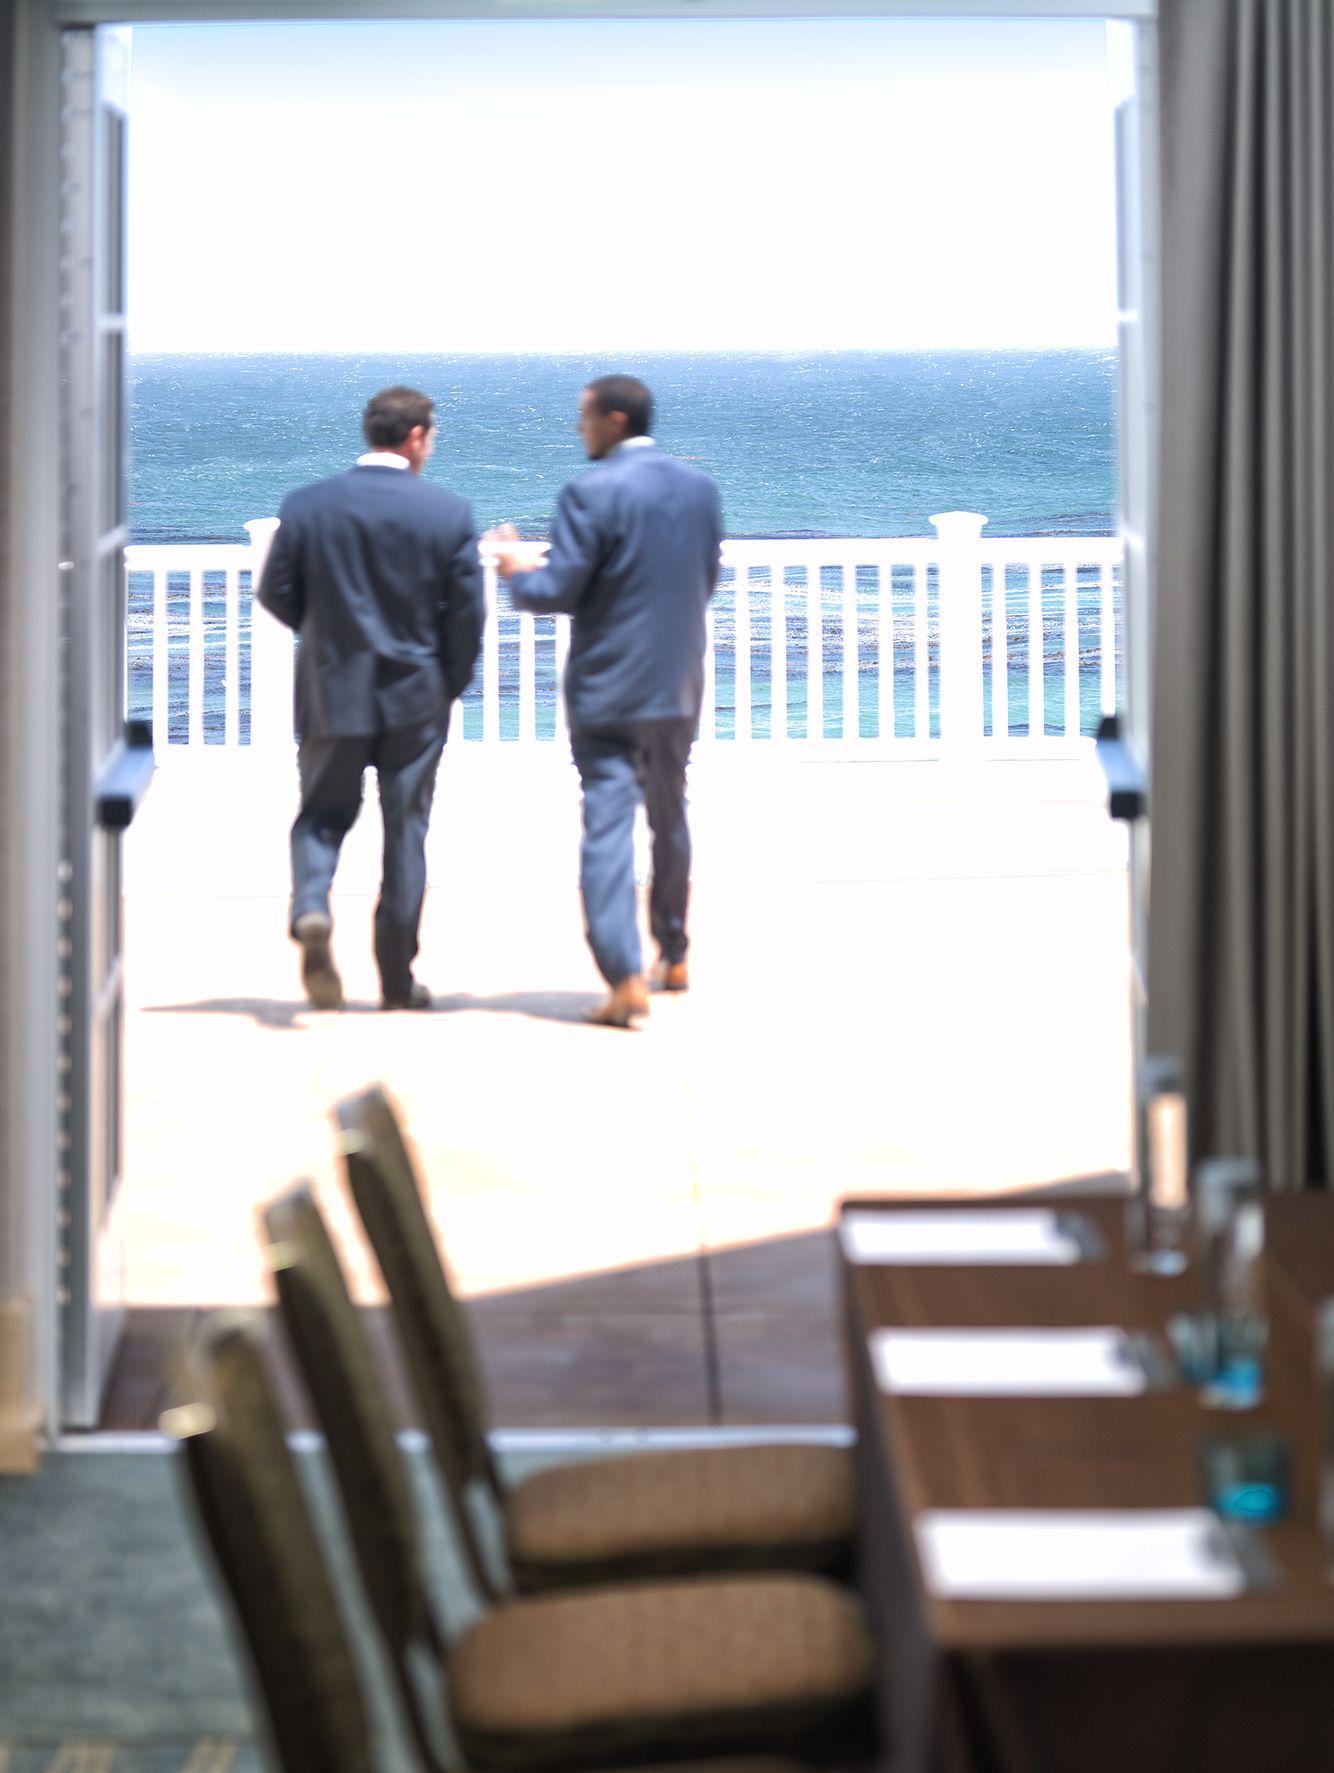 John-Sutton-Photography-InterContinental Hotel Monterey Bay Meeting